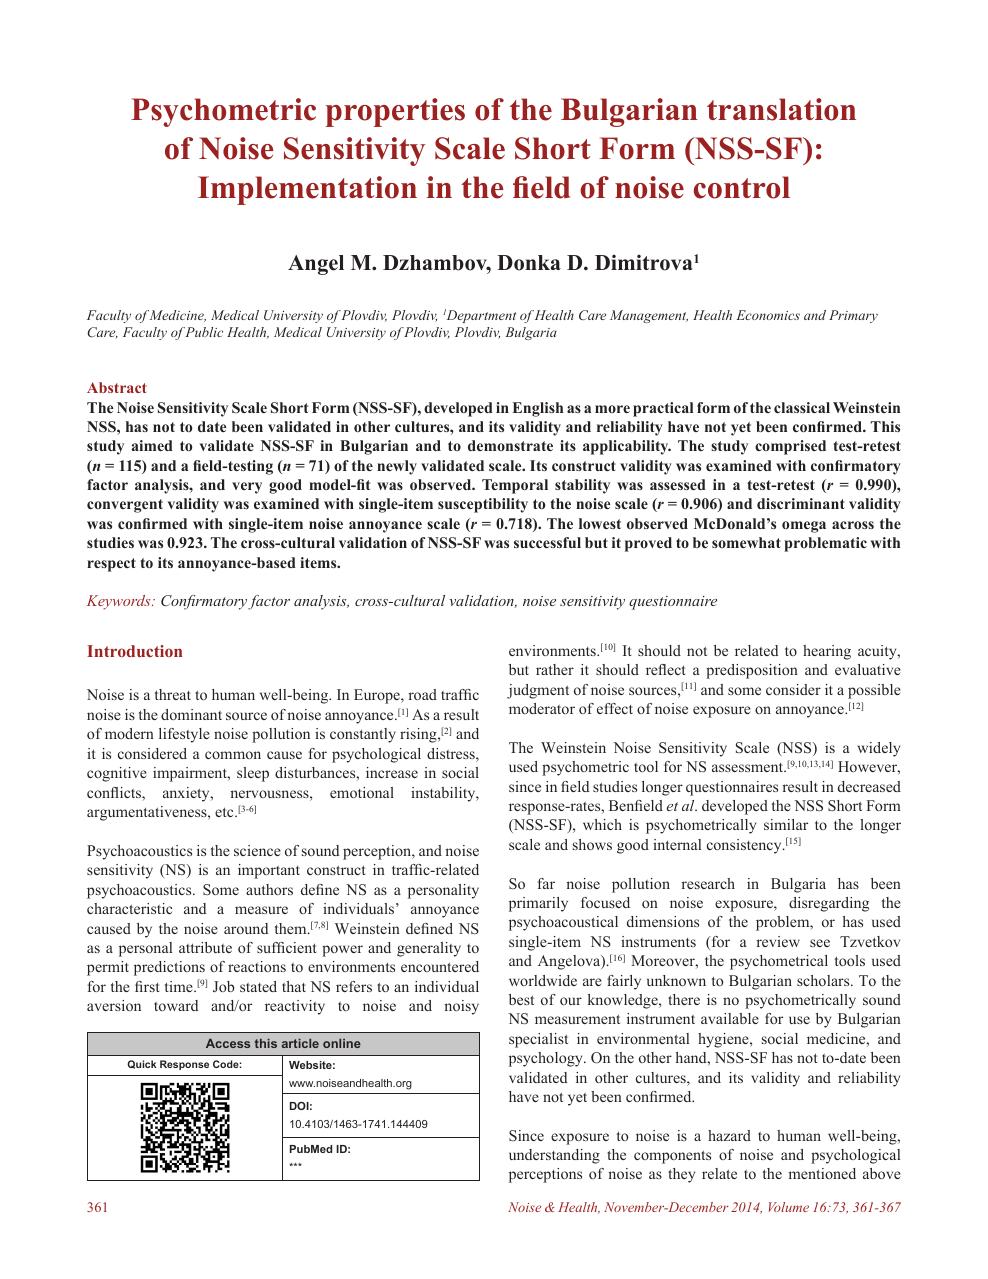 Psychometric properties of the Bulgarian translation of Noise